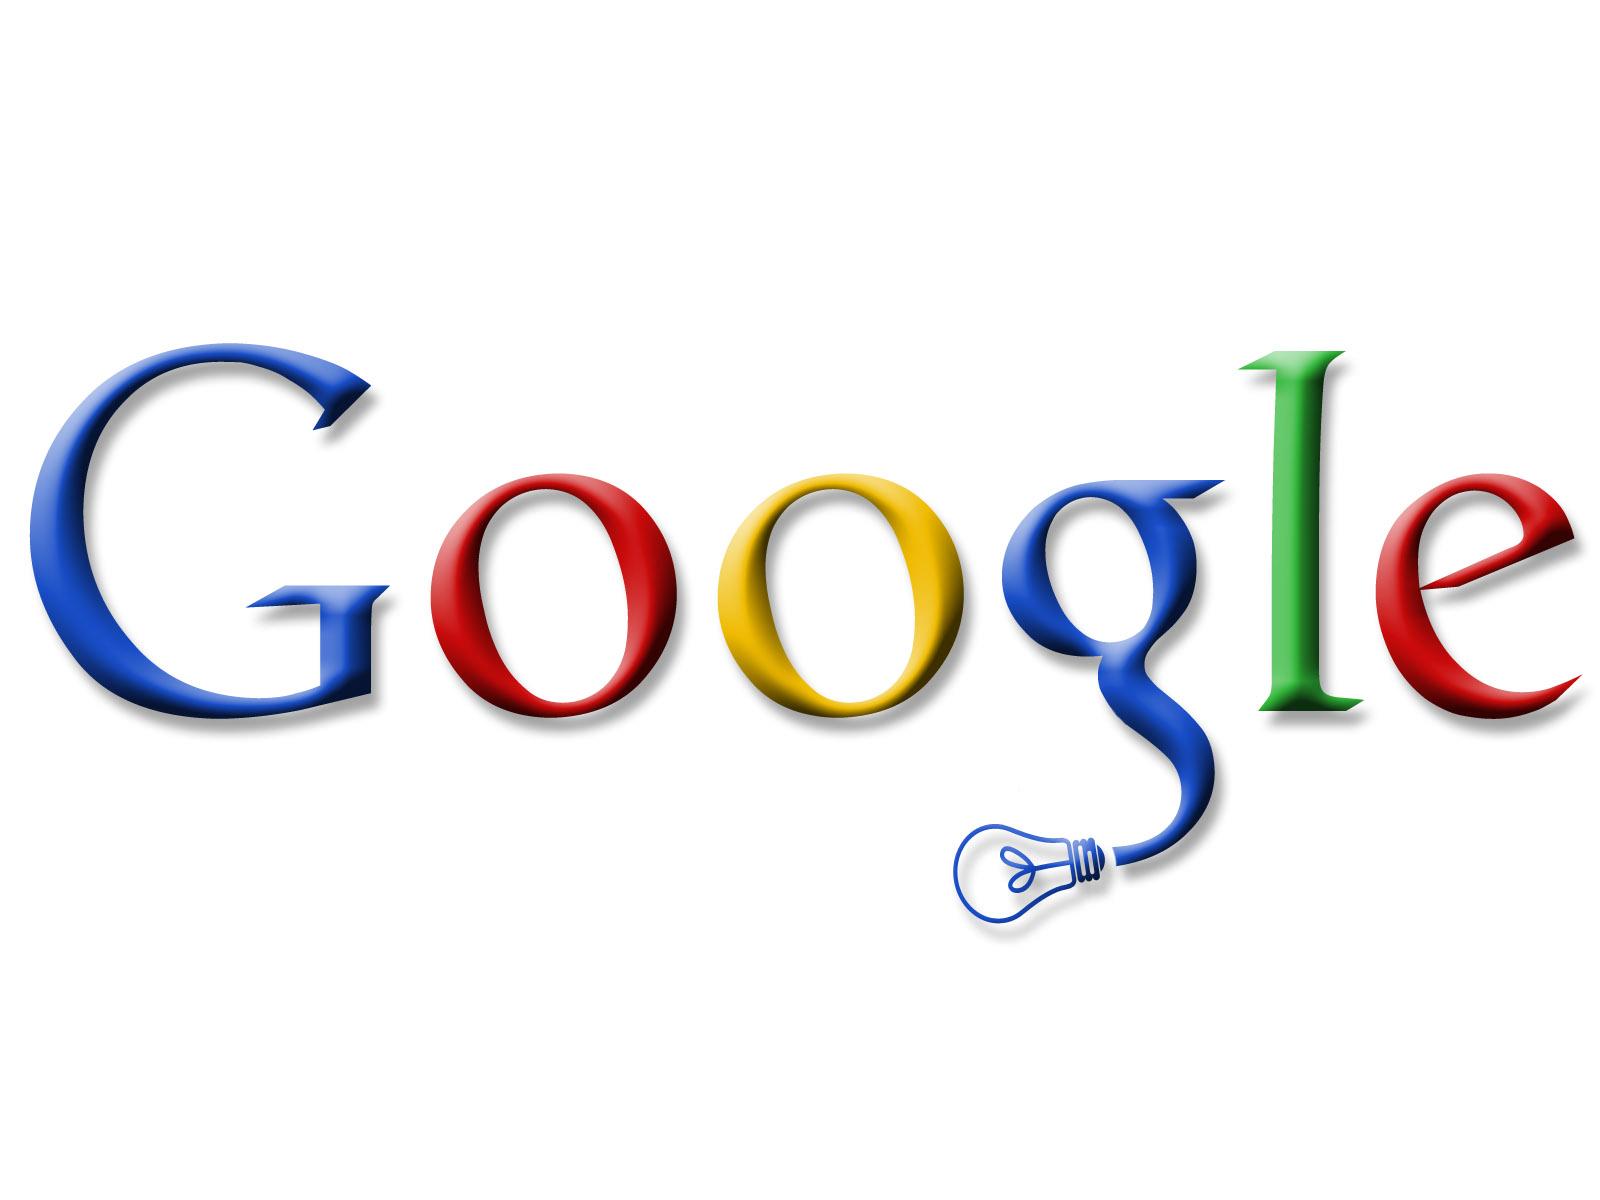 Google Me : un futur concurrent à Facebook ?